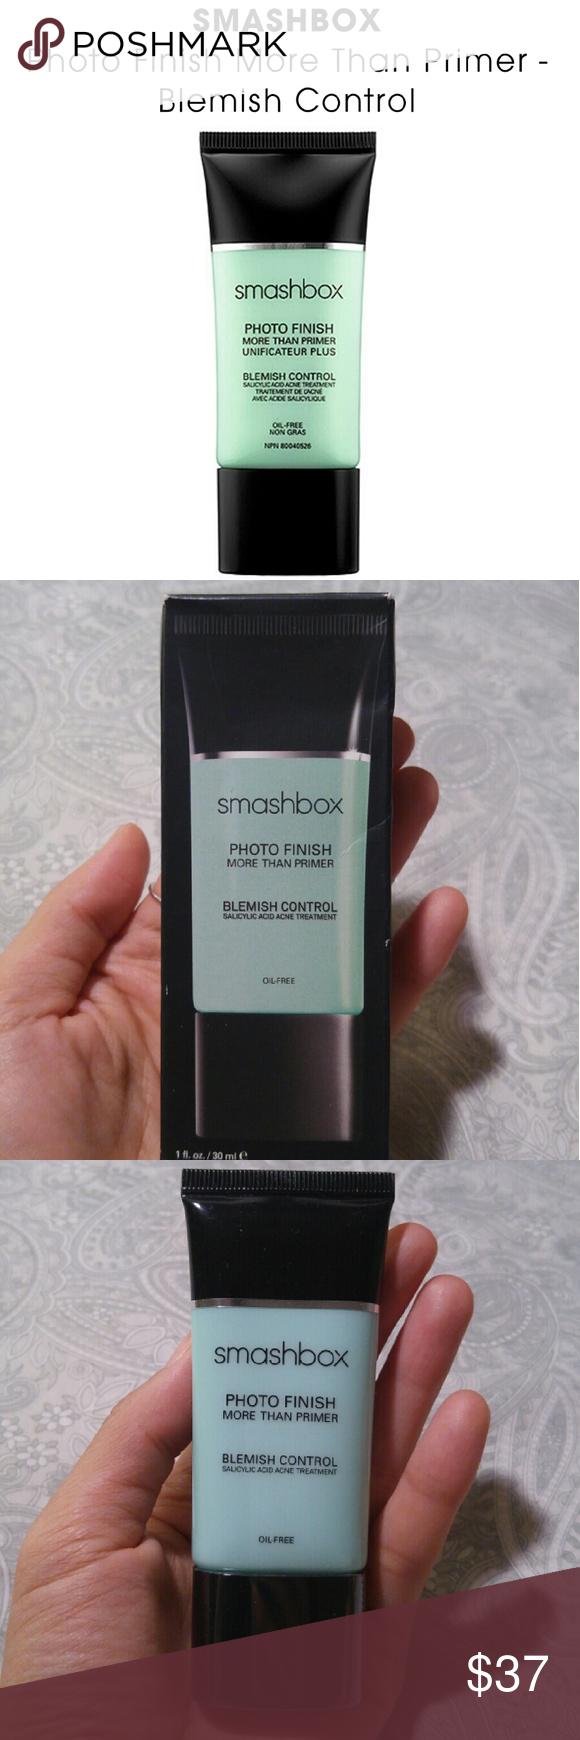 Smashbox More Than Primer Blemish Control My Posh Closet Pinterest